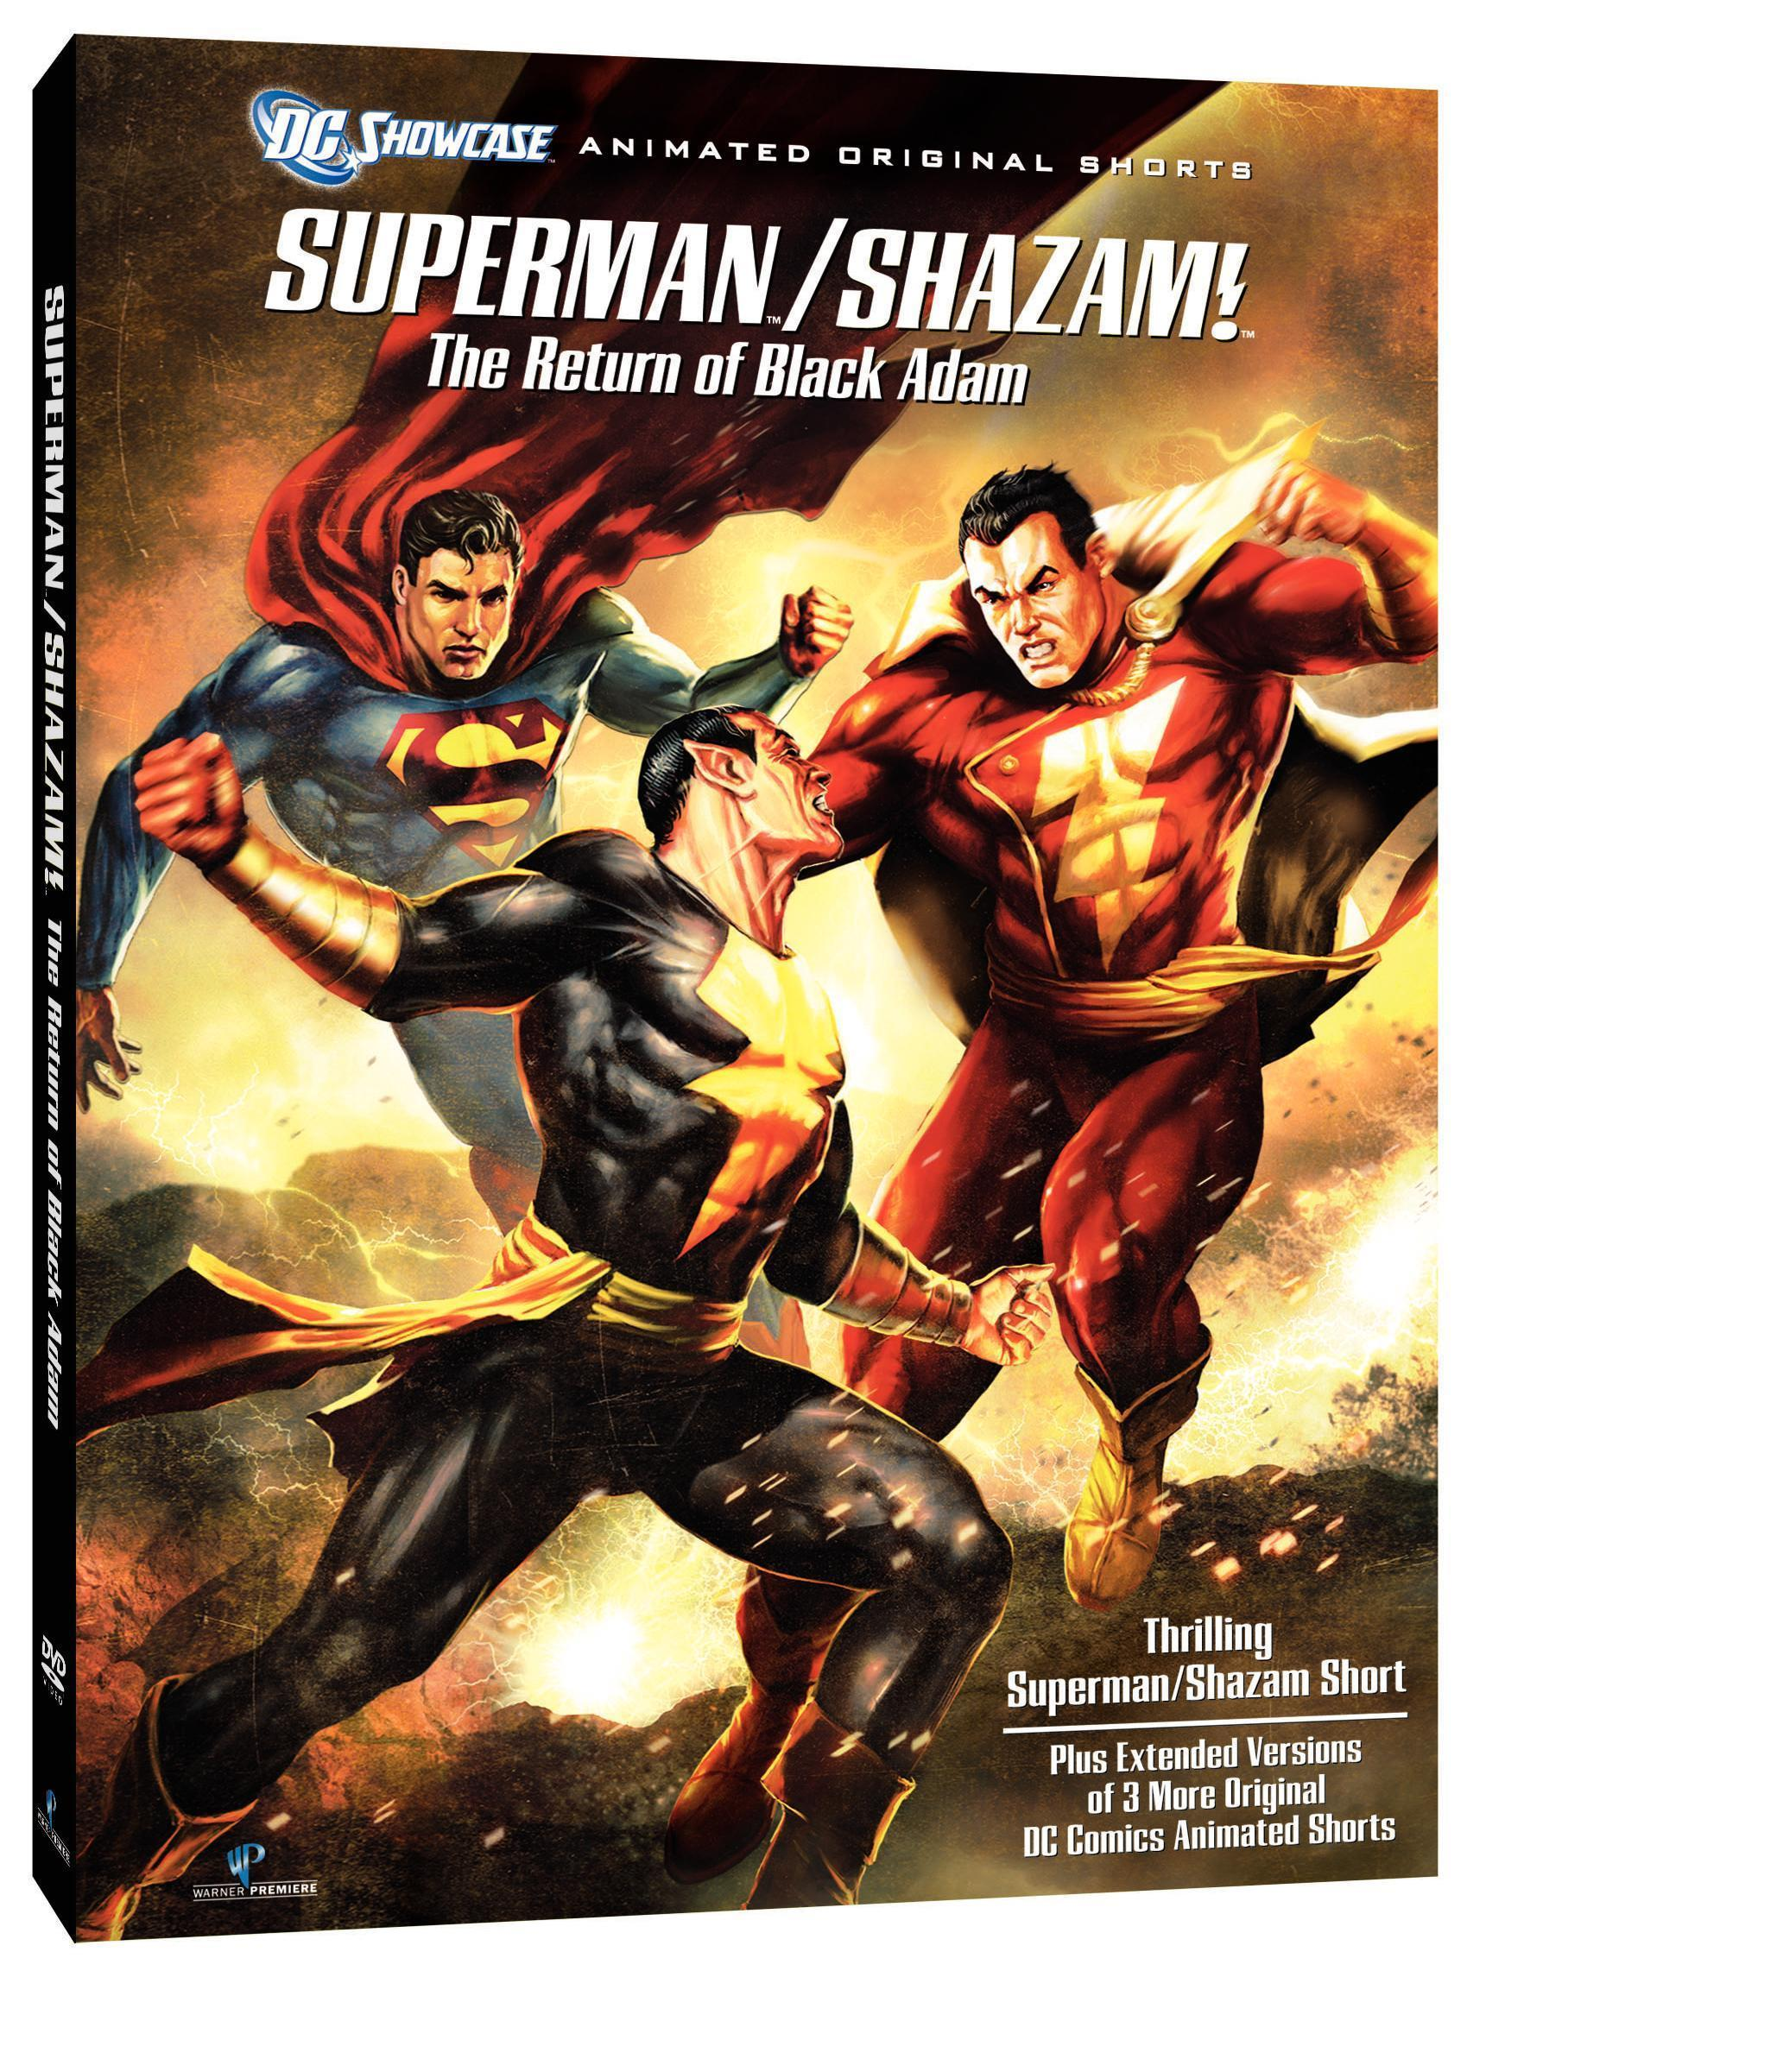 DC Showcase Dvdc